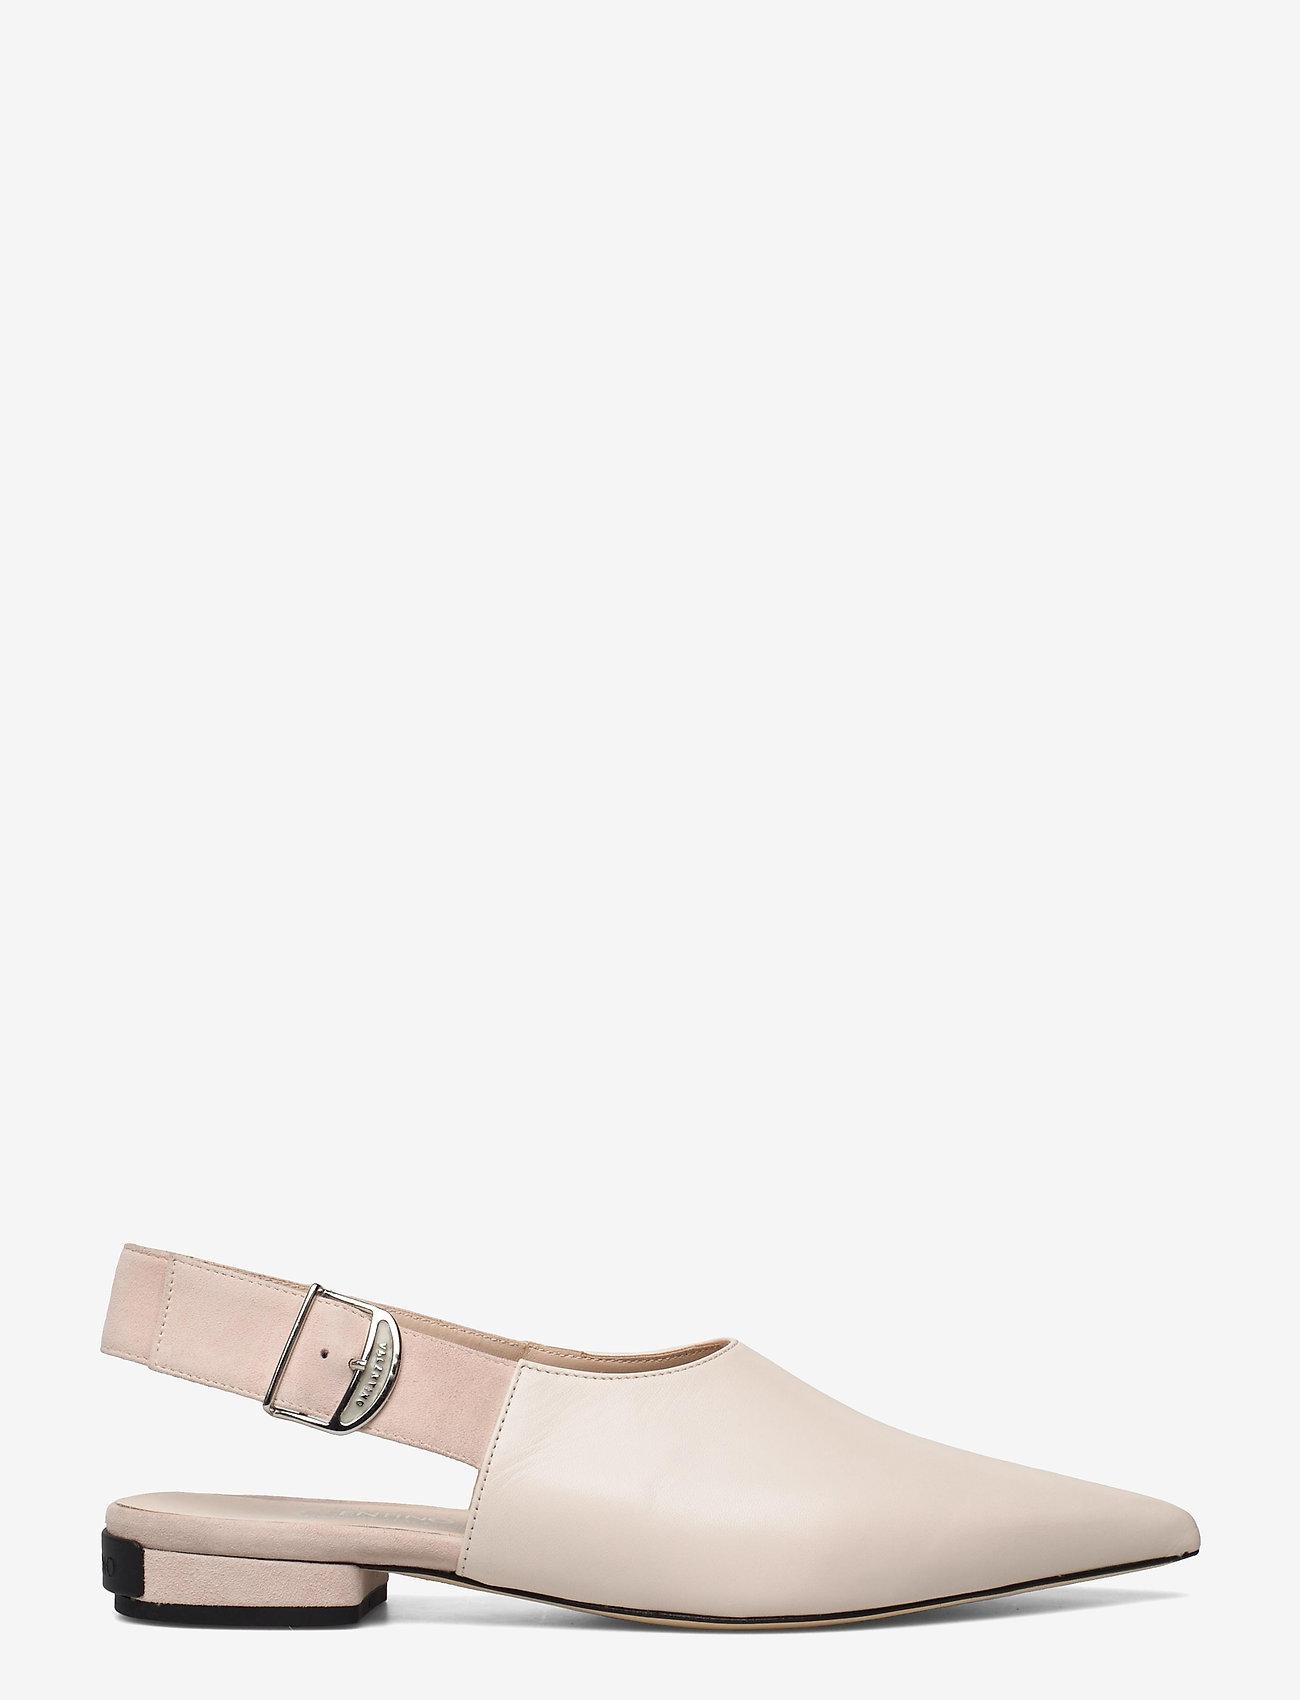 Valentino Shoes - SLINGBACK AND VALENTINO BUCKLE - ballerinas - white - 1